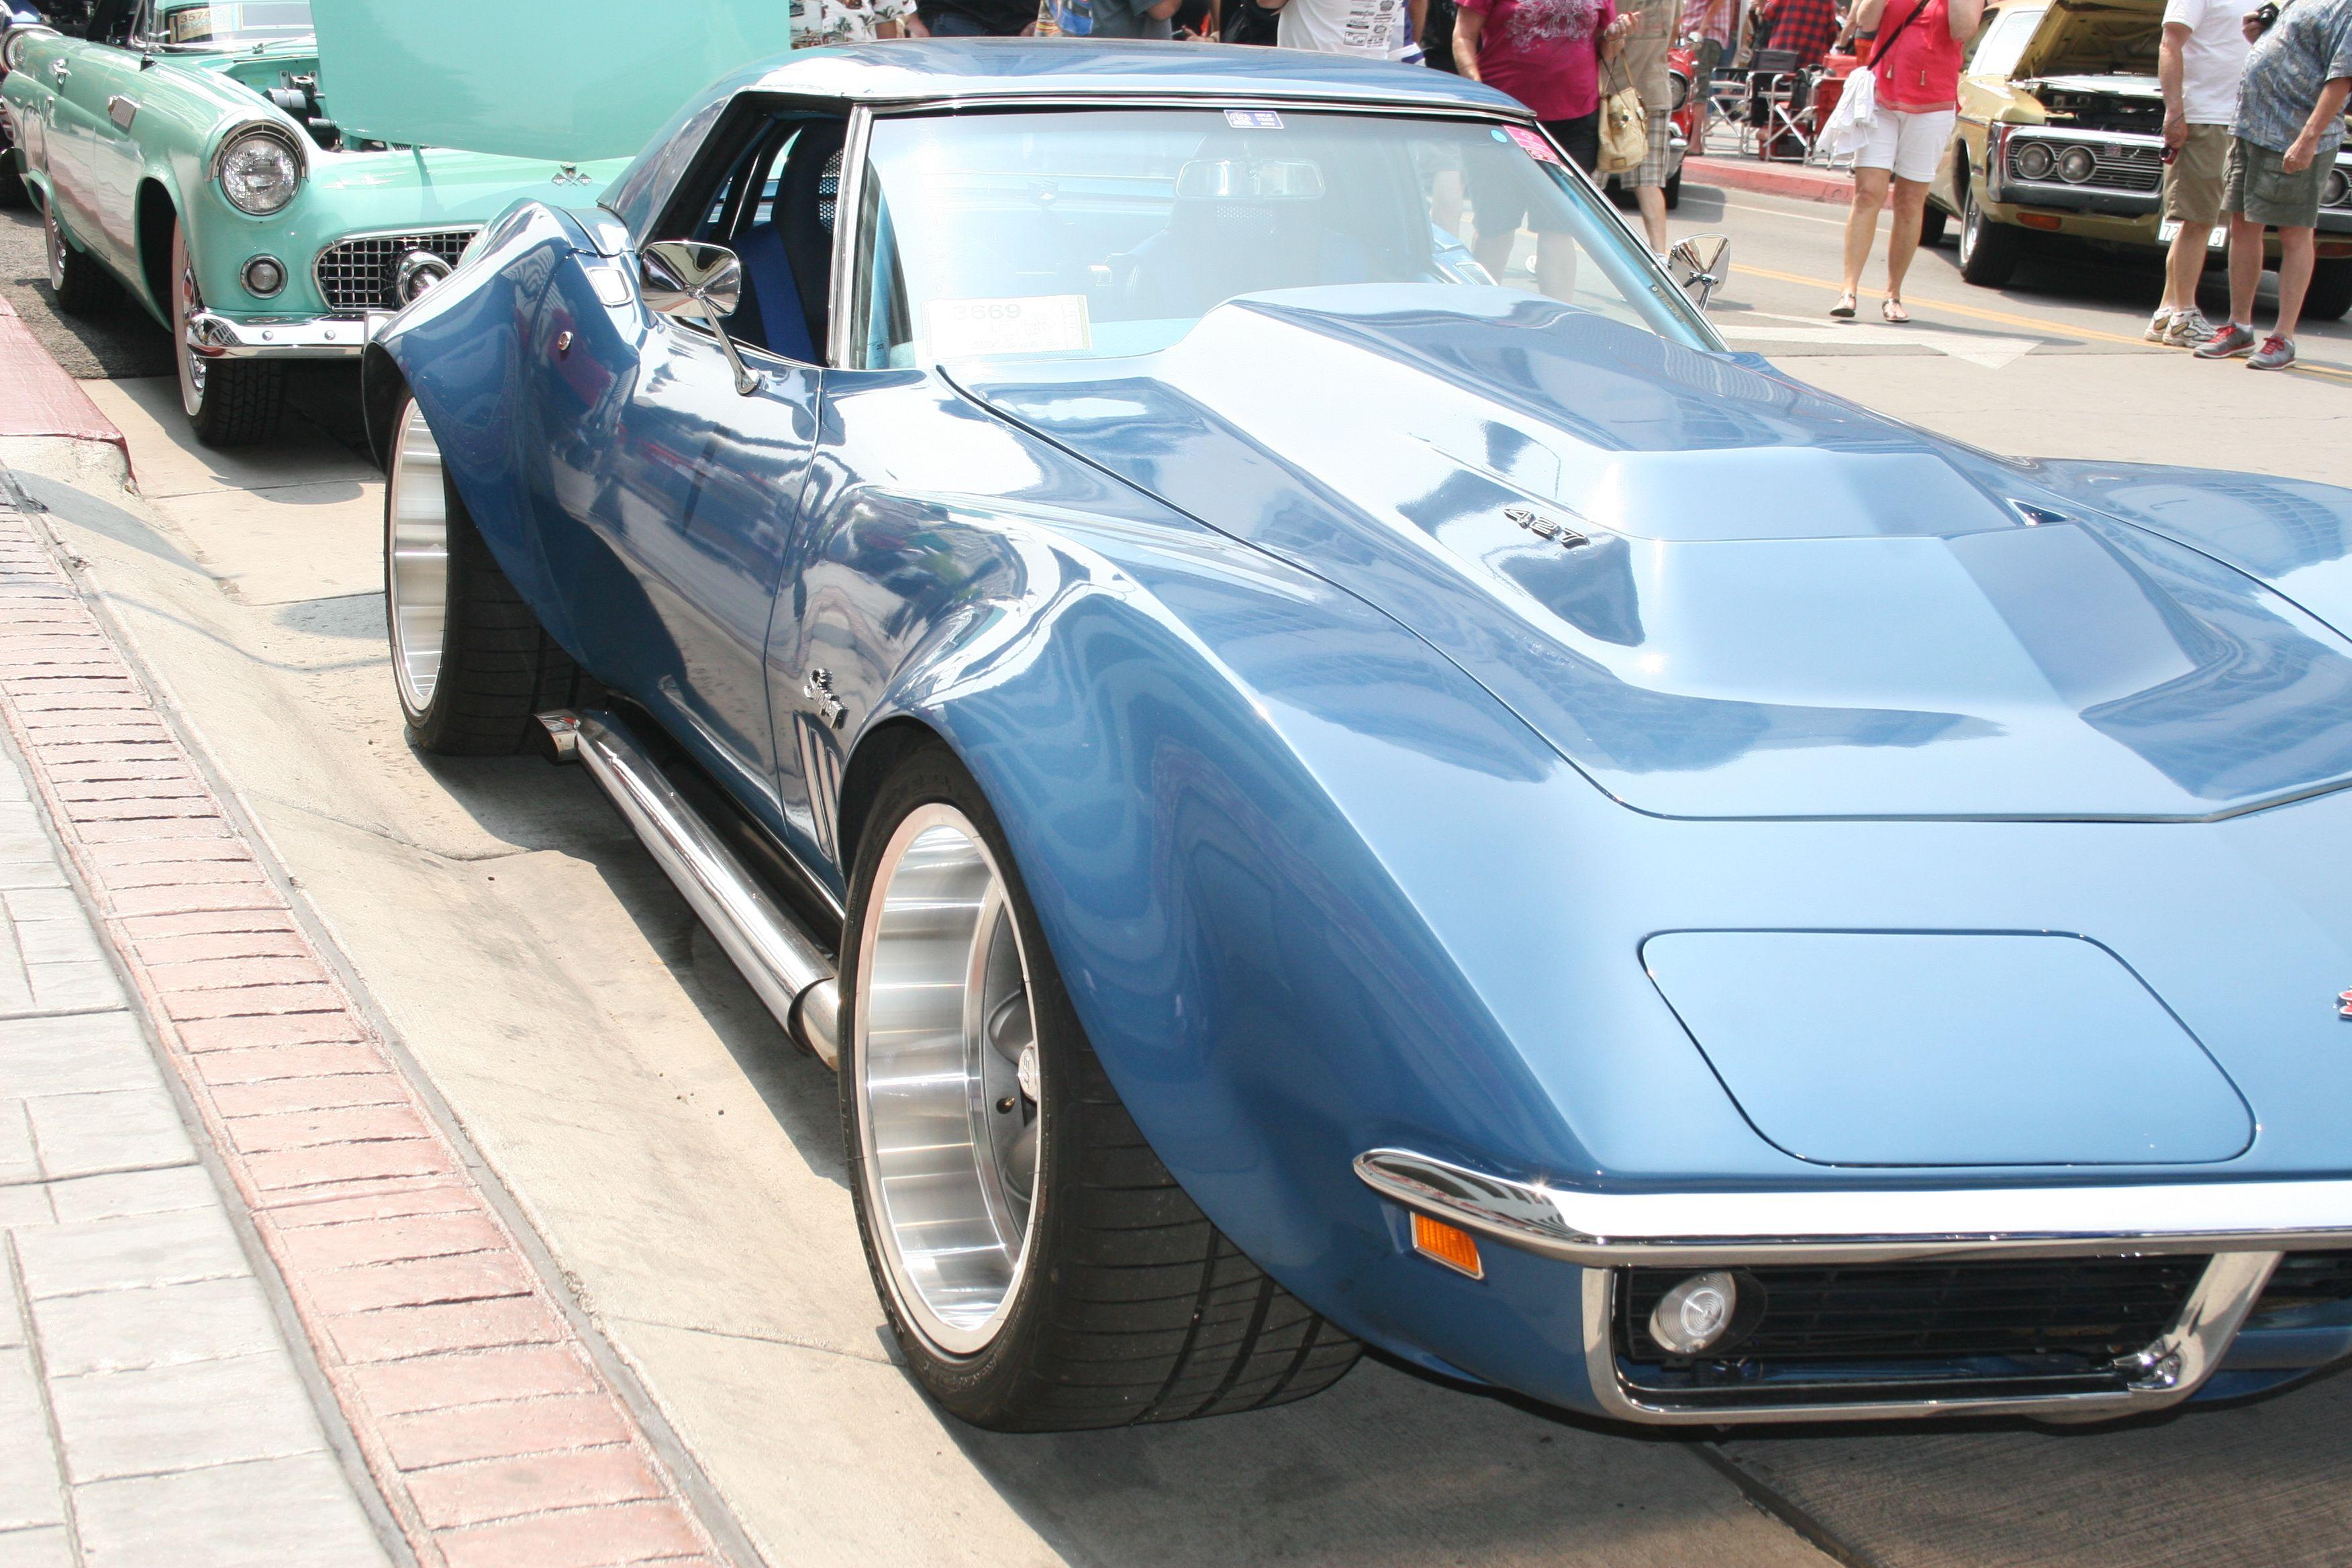 Hot August Nights Reno Nv Corvette Hot August Nights Reno - Hot august nights car show reno nevada